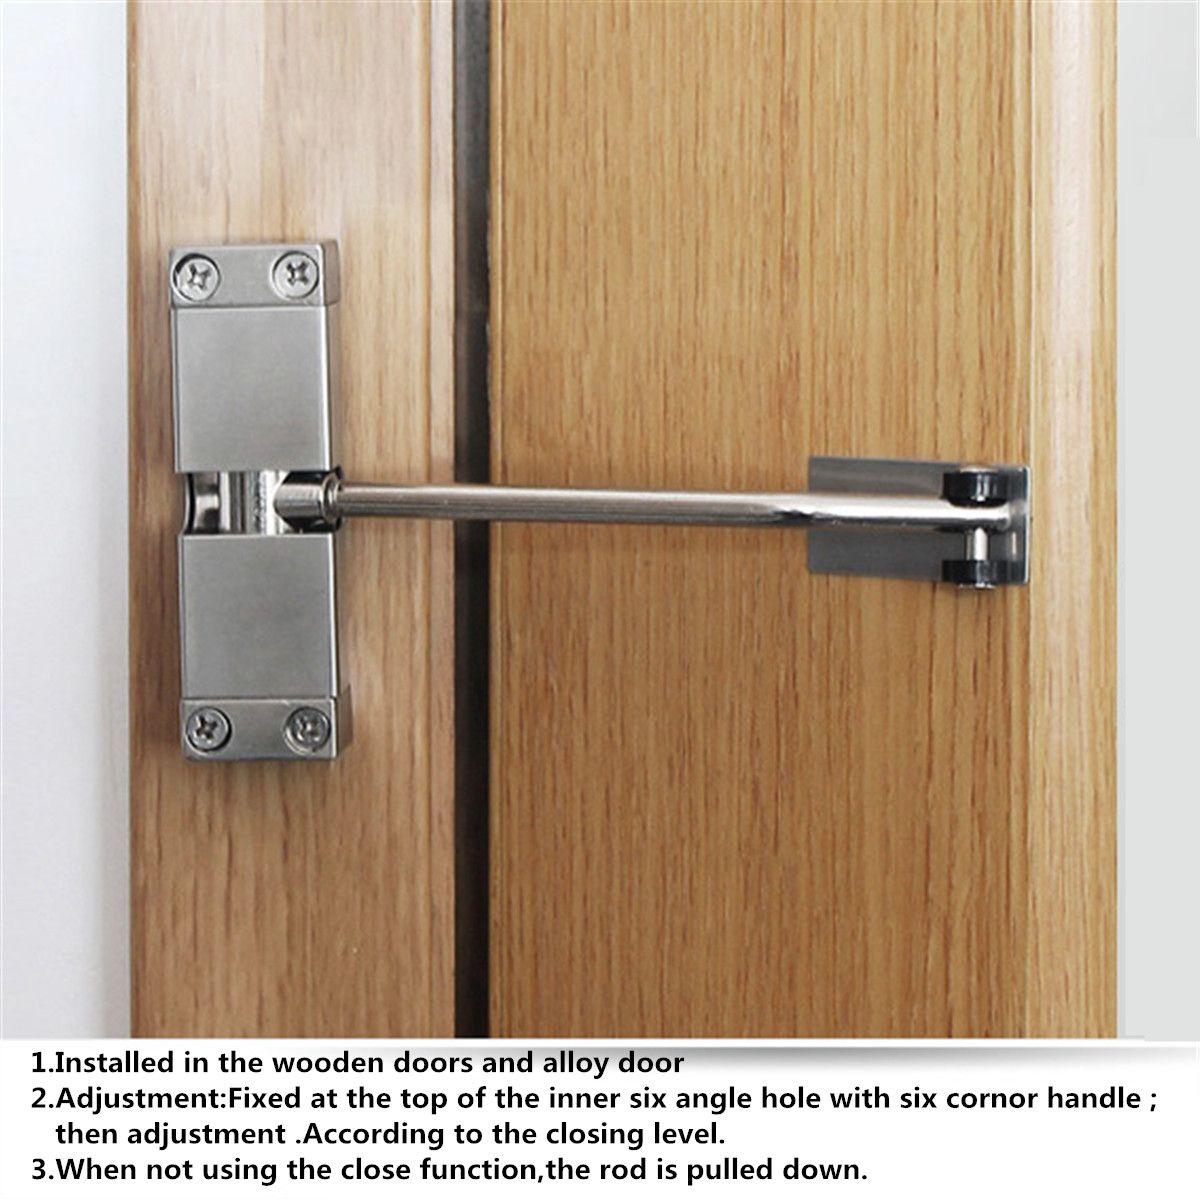 Adjustable Spring Door Closer Automatic Strength Hinge for Fire Rated Door Channel